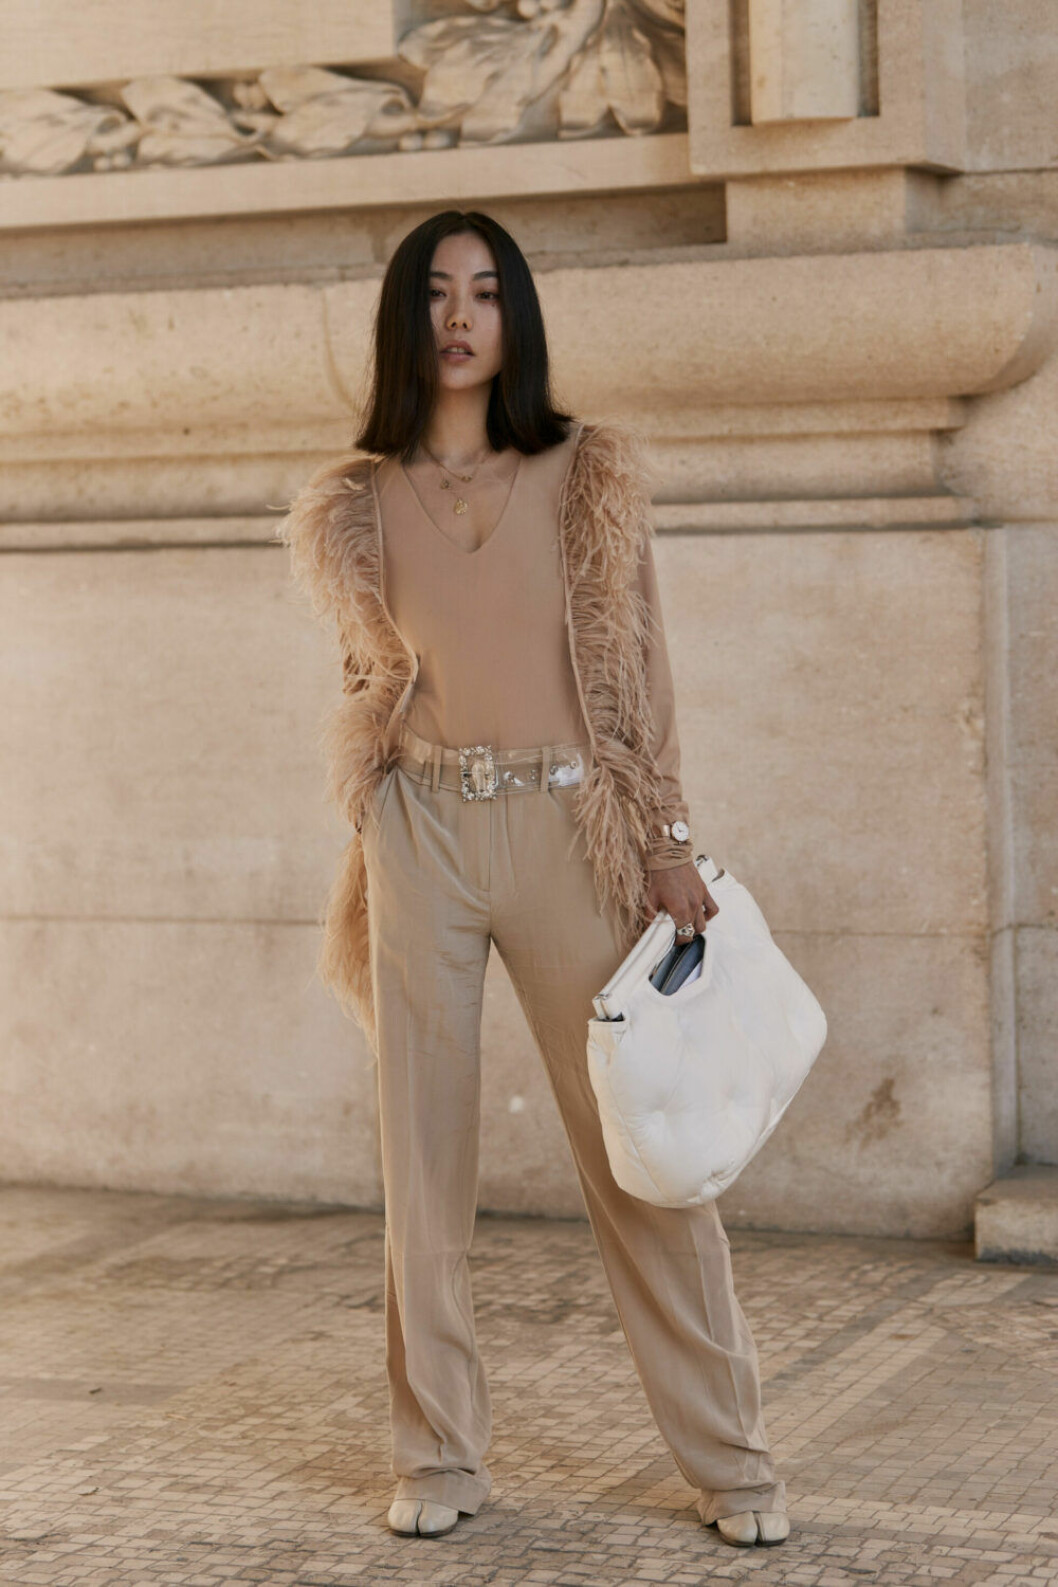 Streetstyle Paris FW, beige look.